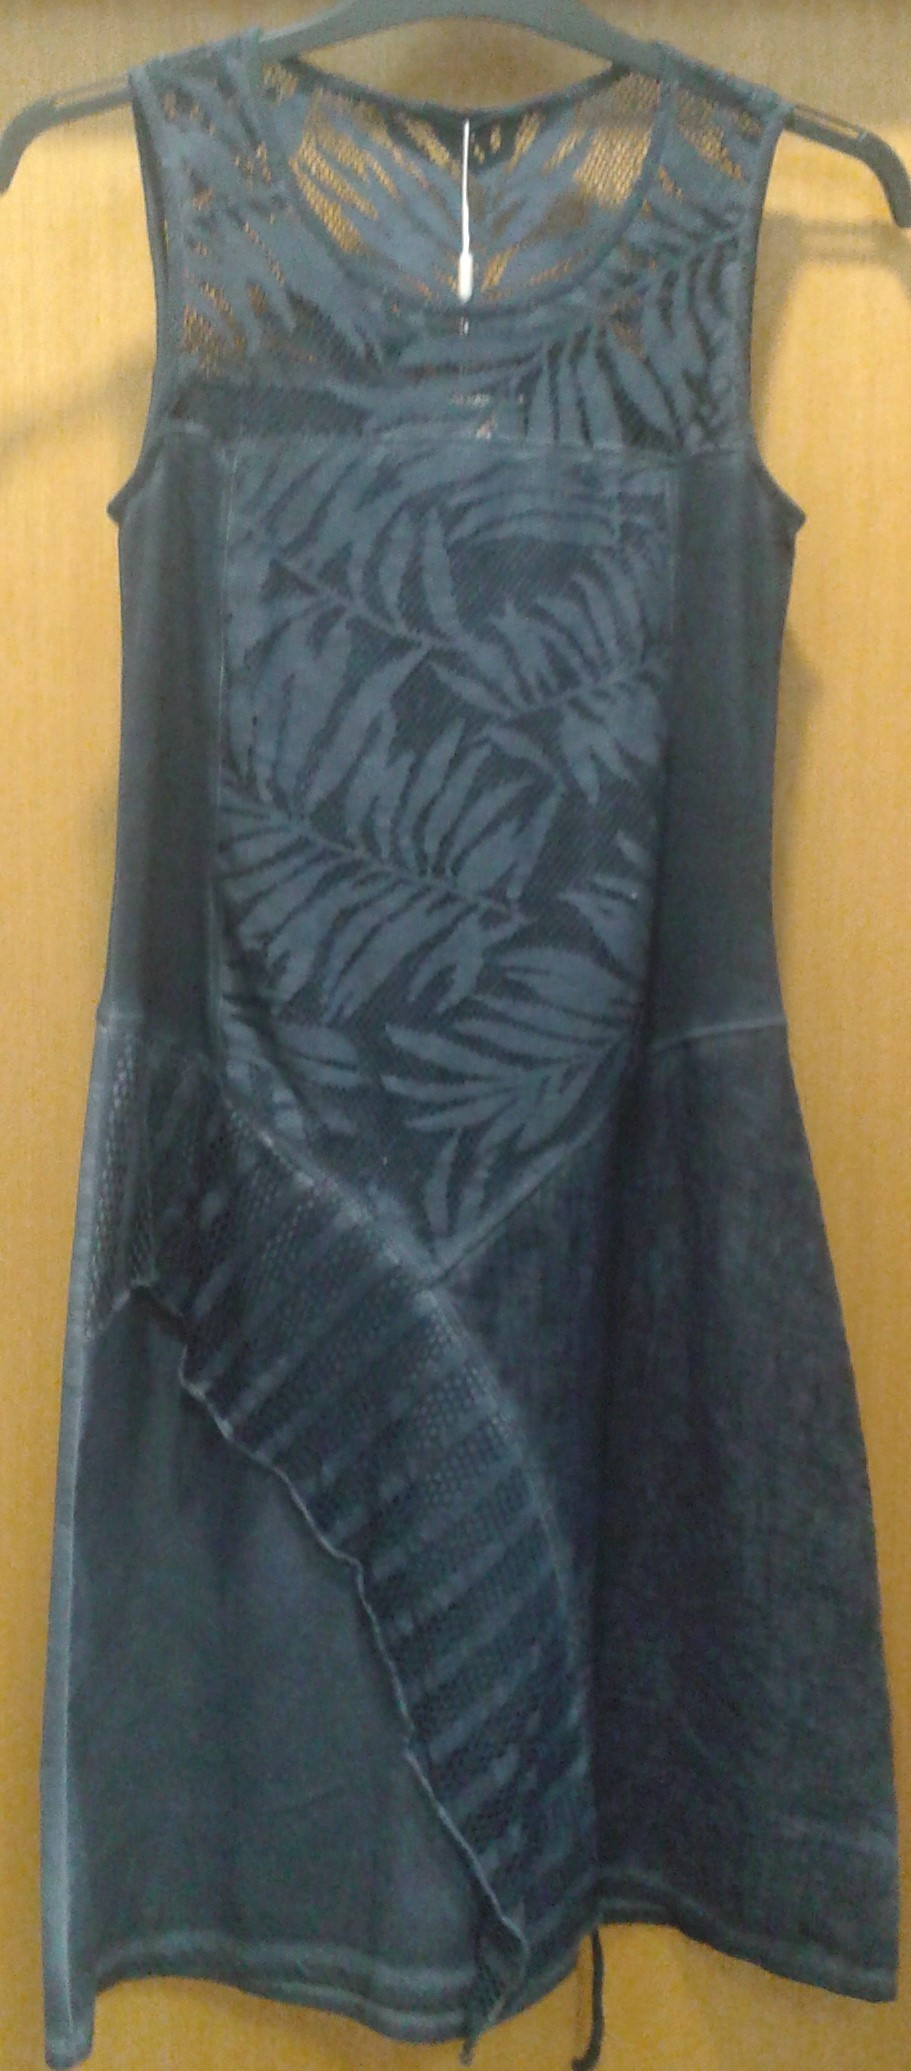 Maloka: Brushed Cotton Fiji Leaf Tied Hem Sundress (More Colors!)